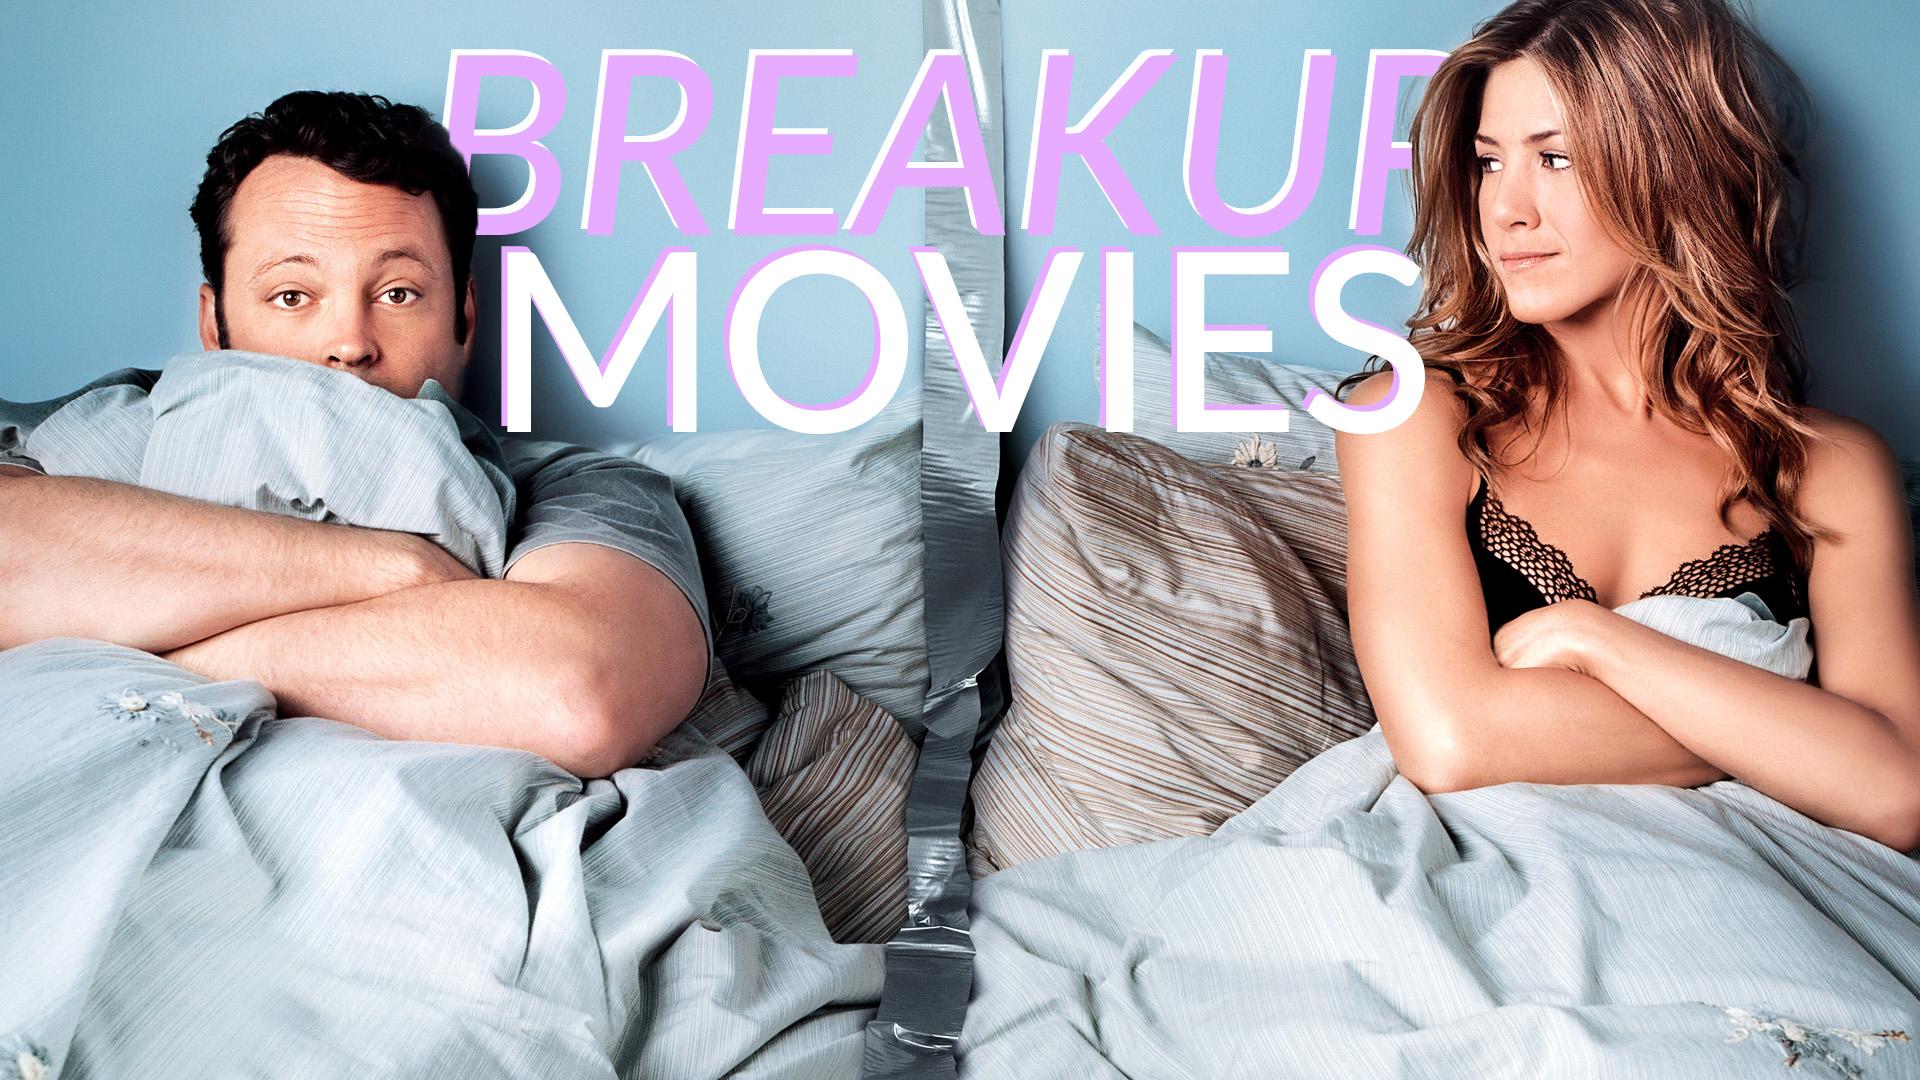 Good break up movies